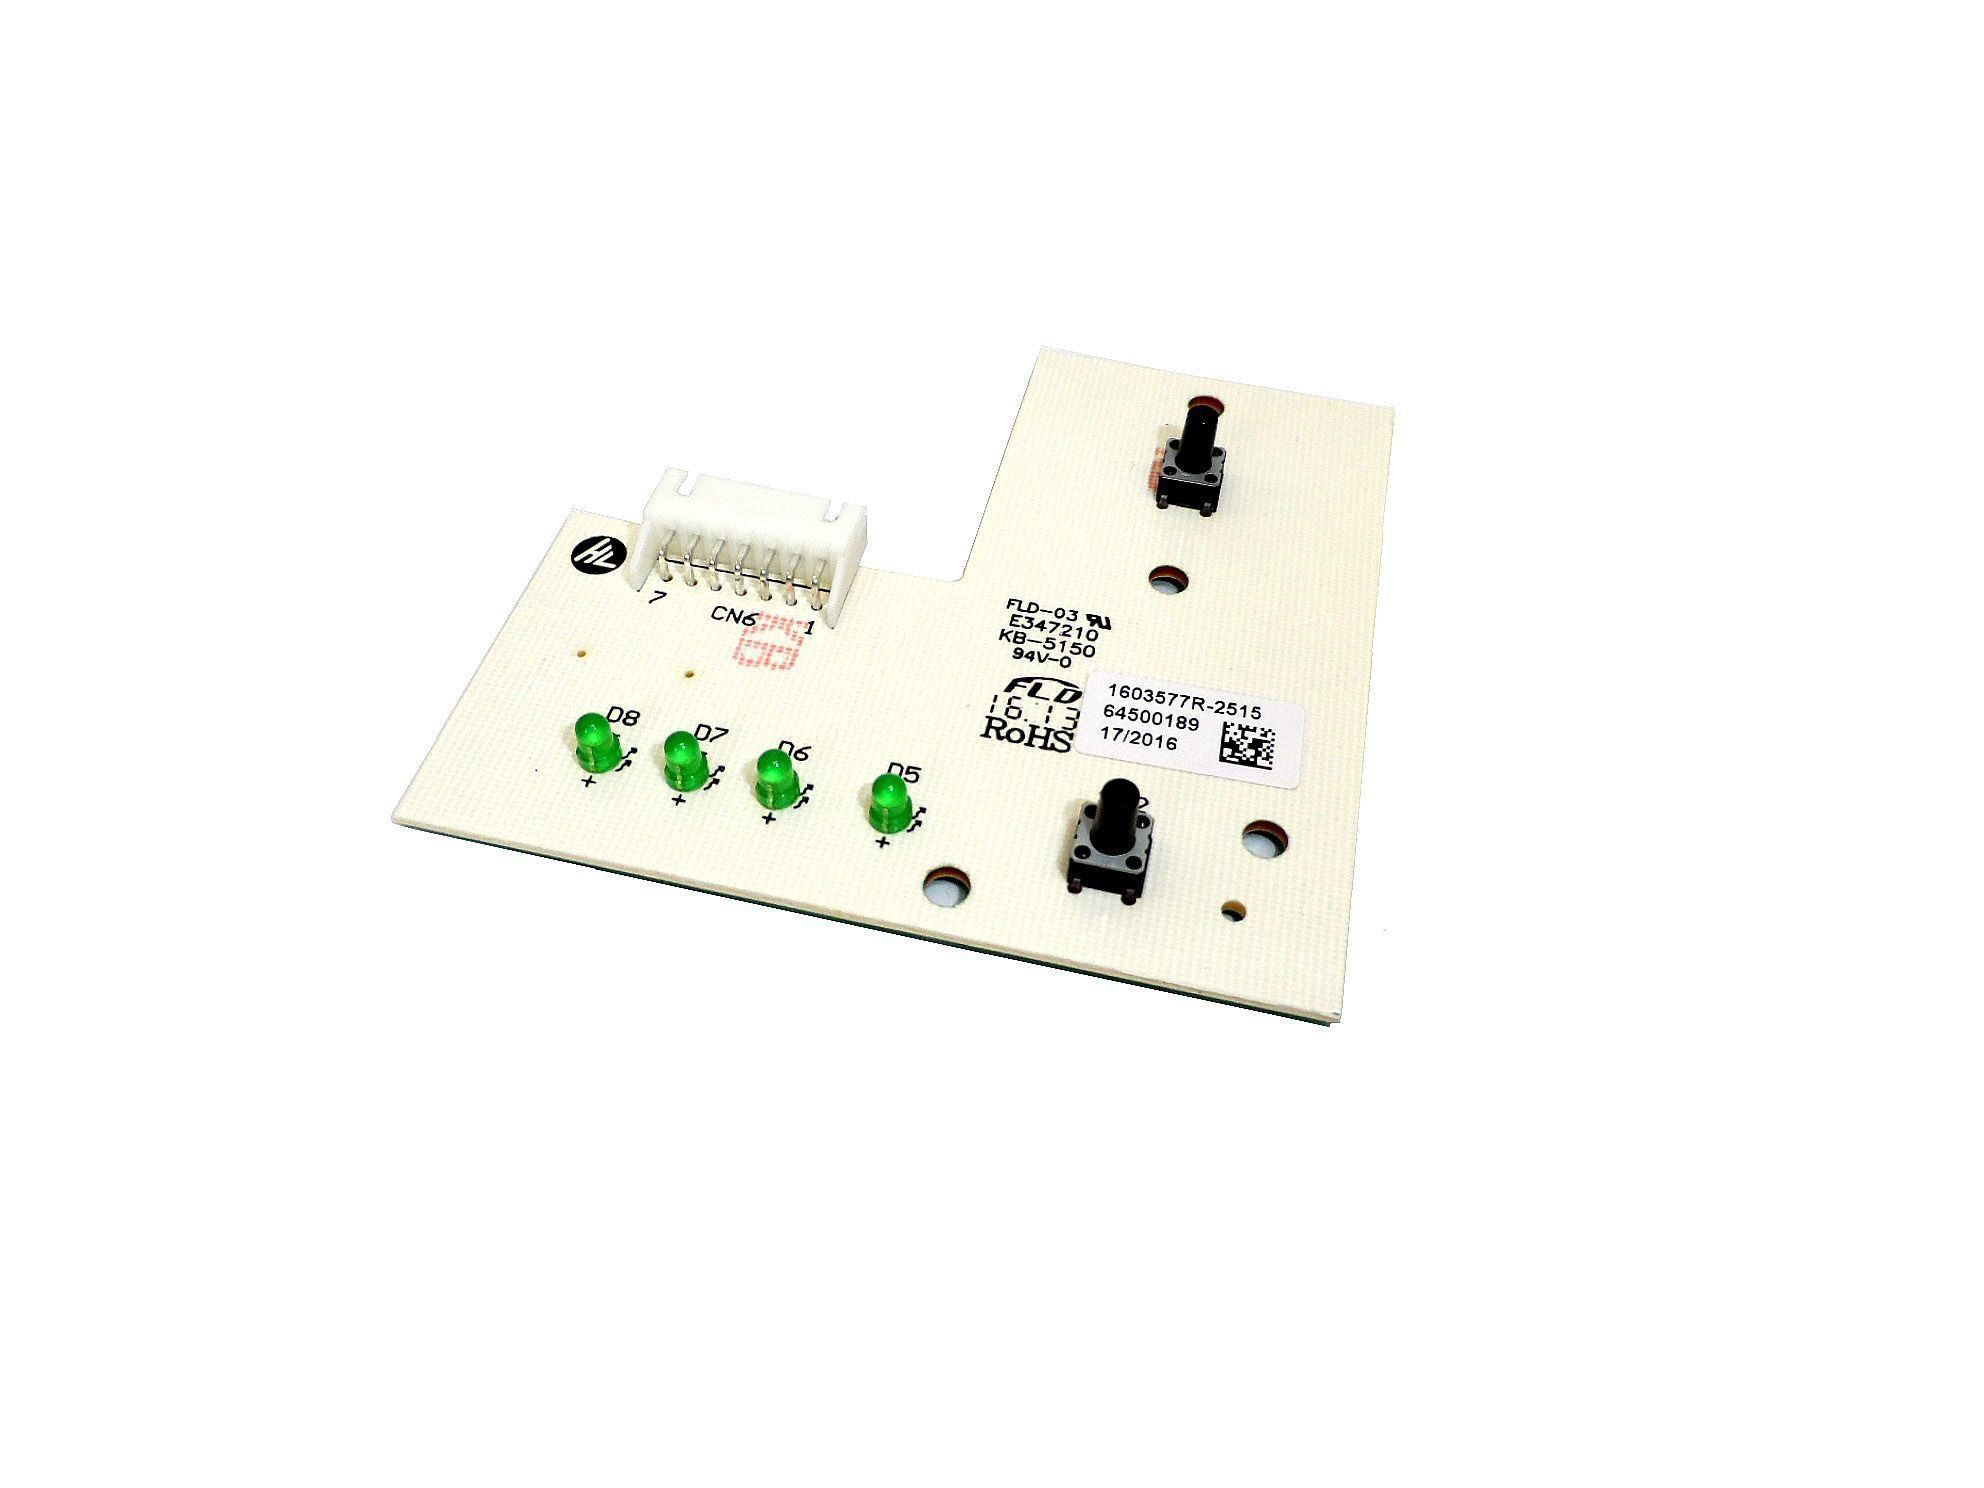 Placa Eletrônica Interface Lavadora Electrolux  64500189